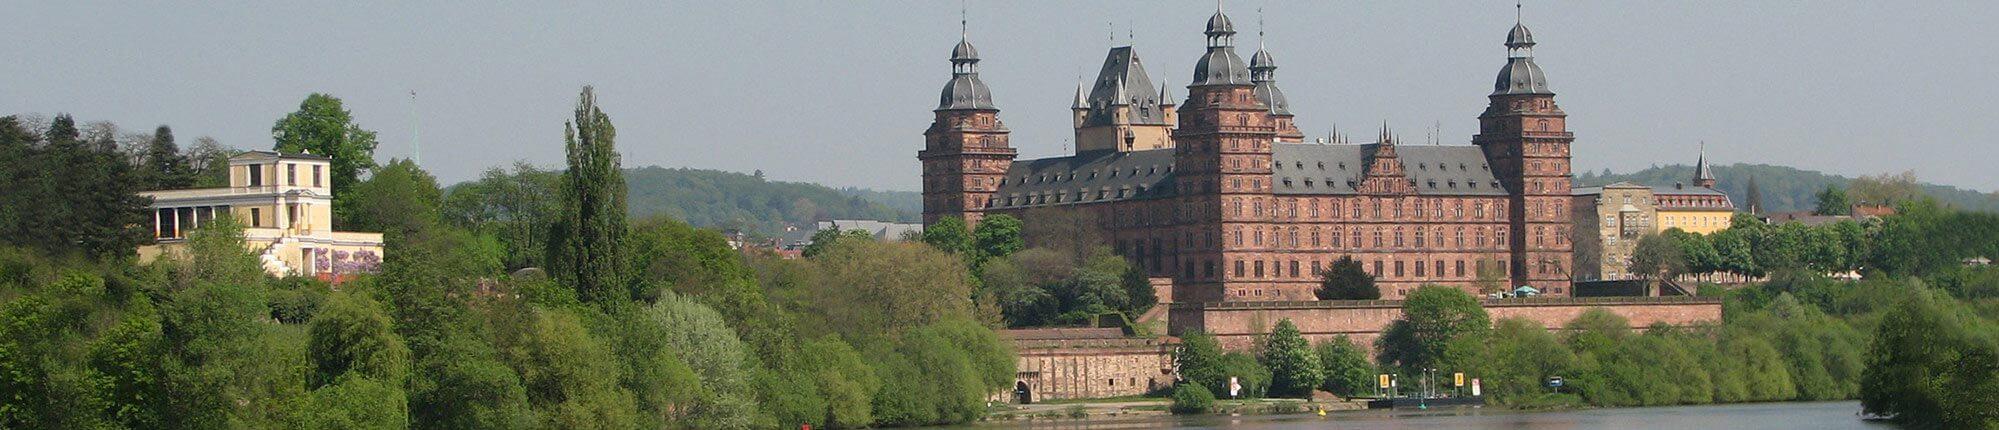 Schloss Johannisburg, Aschaffenburg, Main, Rhein-Main, Unterfranken, Main Radweg